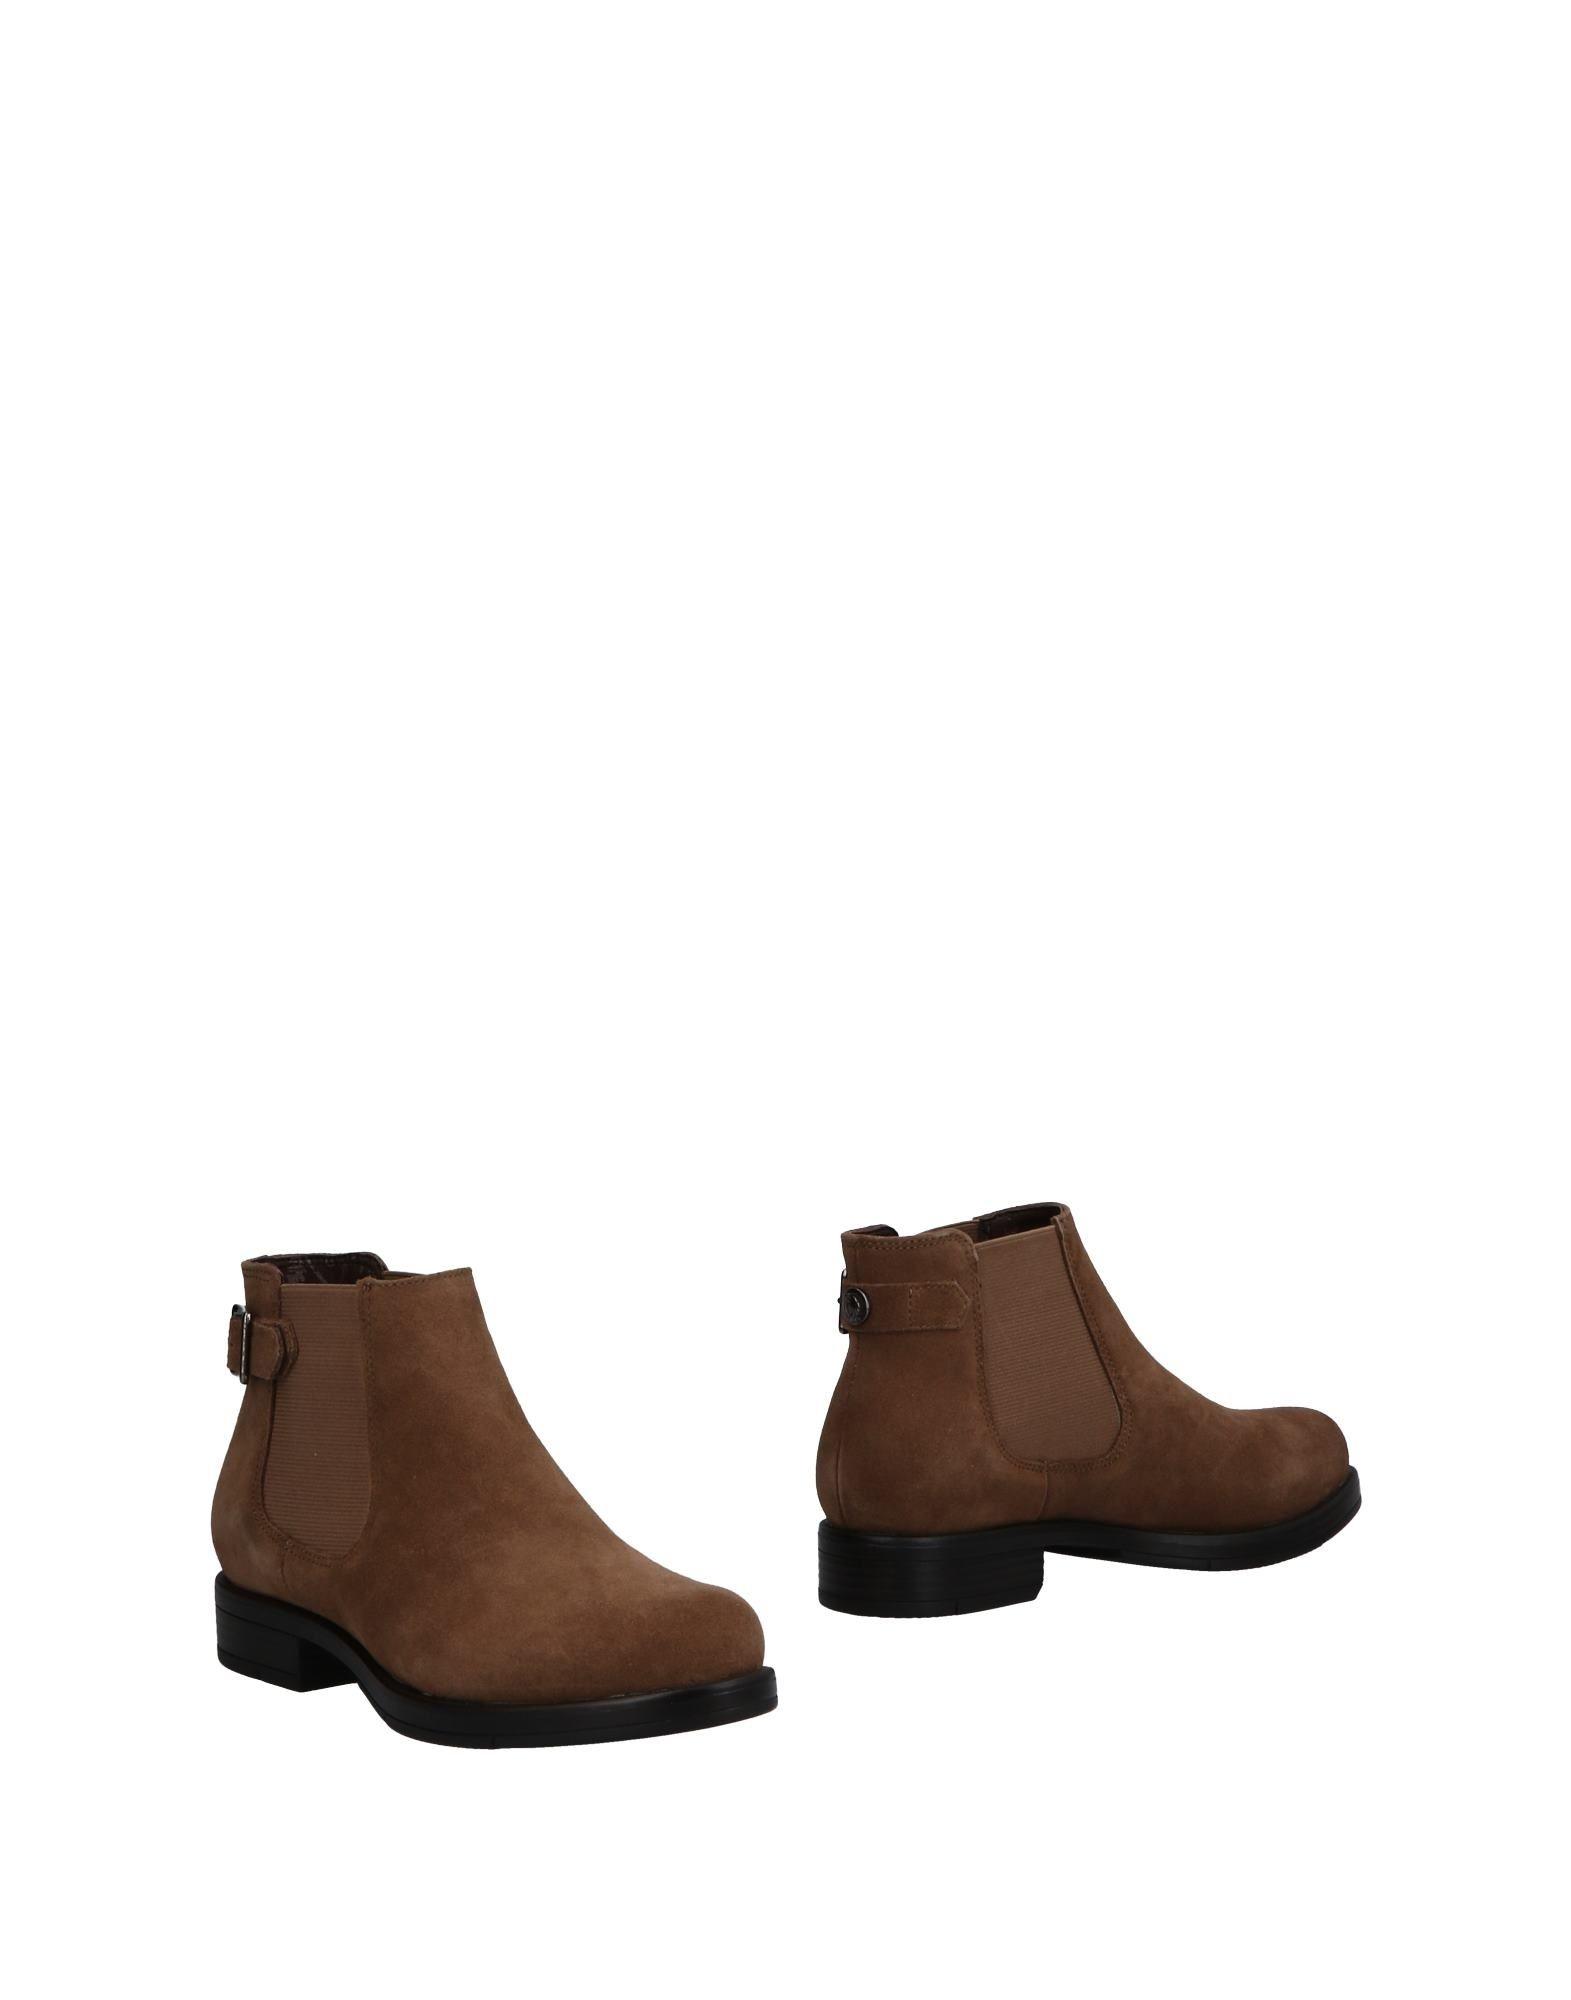 U.S.Polo Assn. Chelsea Gute Boots Damen  11497235JE Gute Chelsea Qualität beliebte Schuhe ce007b